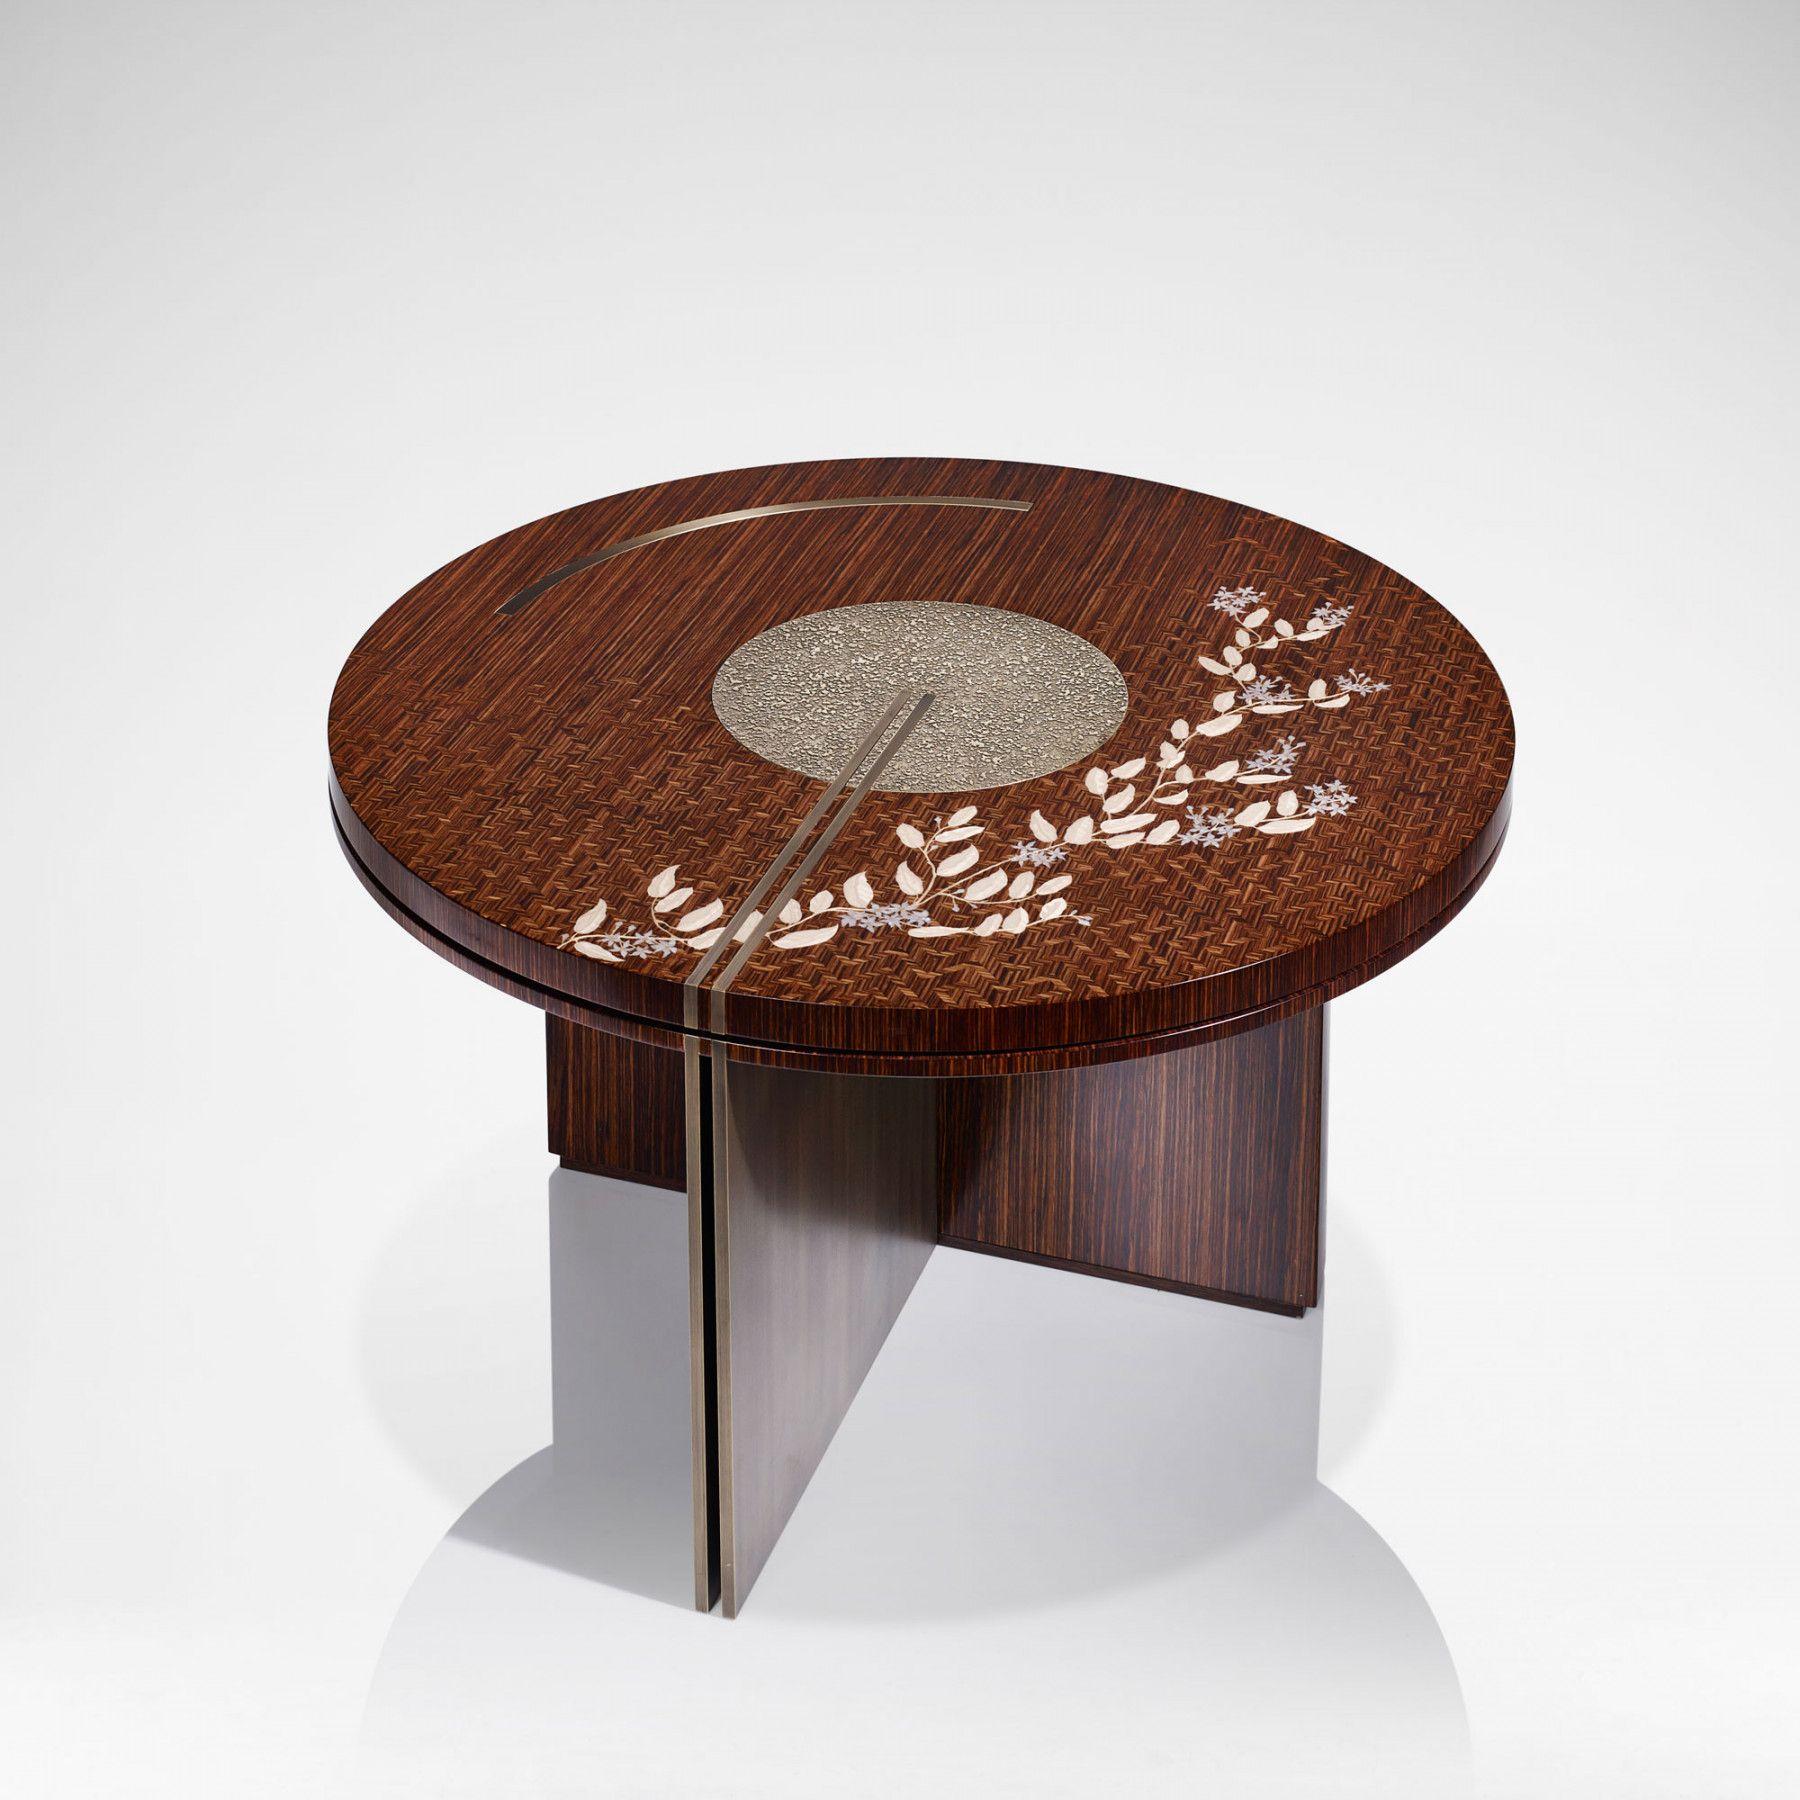 Alba Coffee Table Furniture Luxury Gifts Homeware Furniture Interior Design Bespoke Coffee Table Furniture Coffee Table Living Room Coffee Table [ 1800 x 1800 Pixel ]